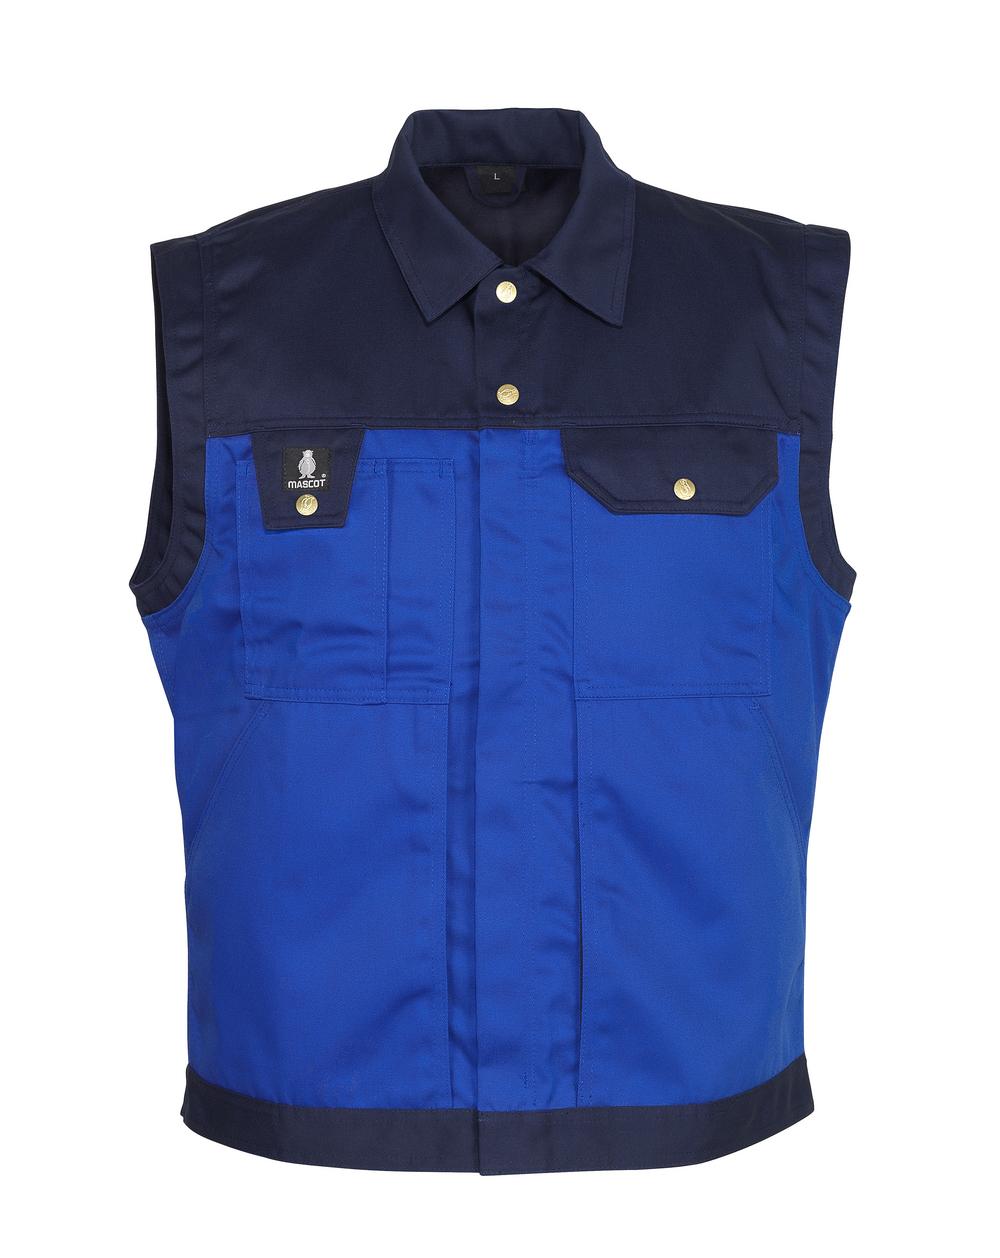 00990-430-1101 Chaleco - azul real/azul marino